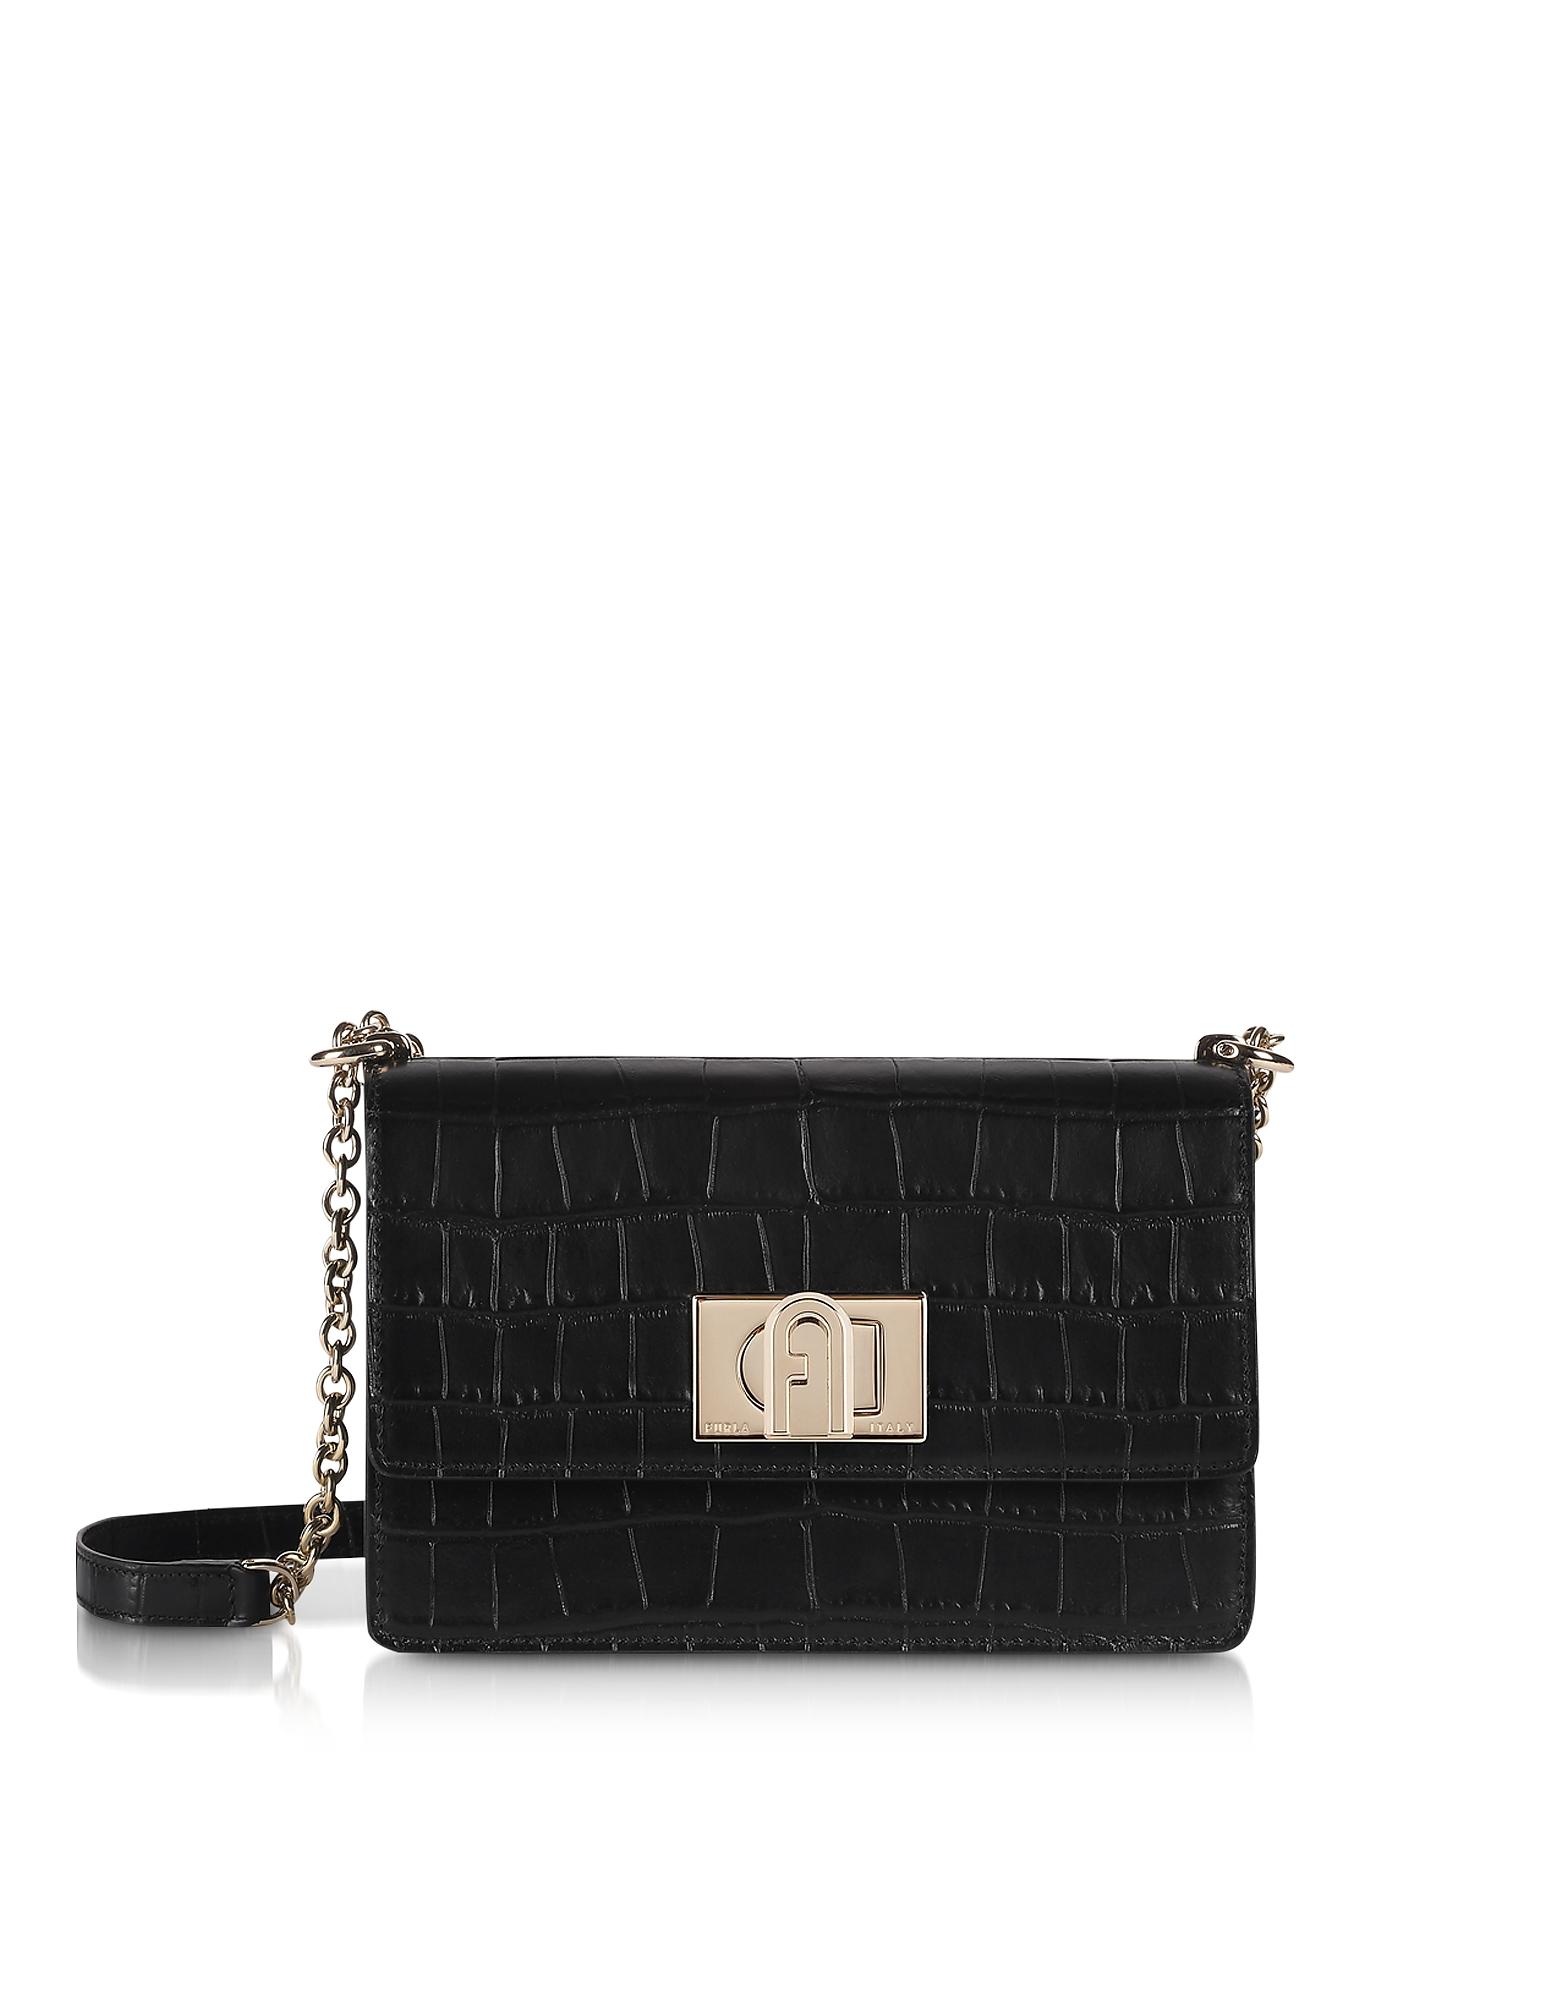 Furla Designer Handbags, Black Croco Embossed Leather 1927 Mini Crossbody Bag 20